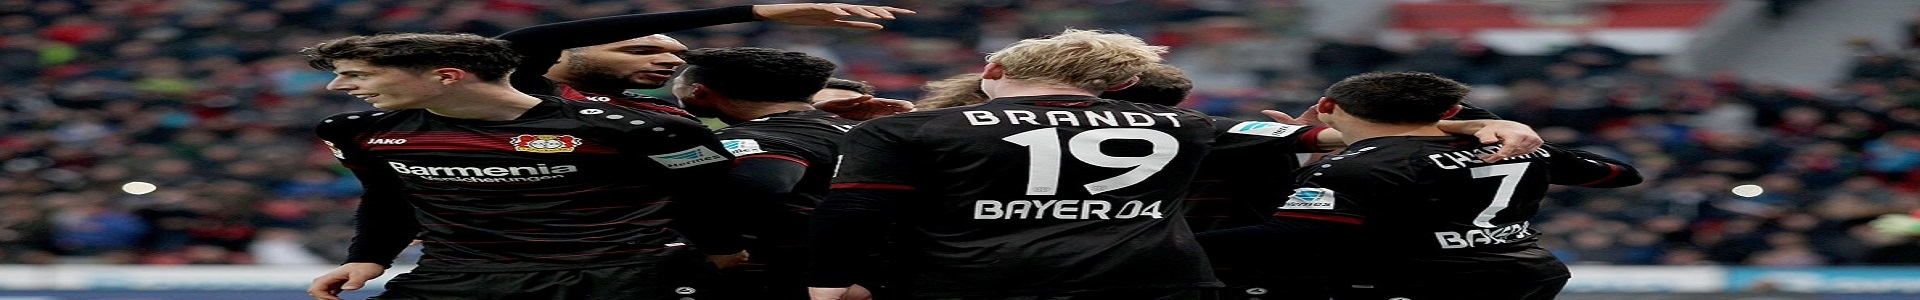 ExtraOffre Sport Banner Bayer 04 Leverkusen Supporter